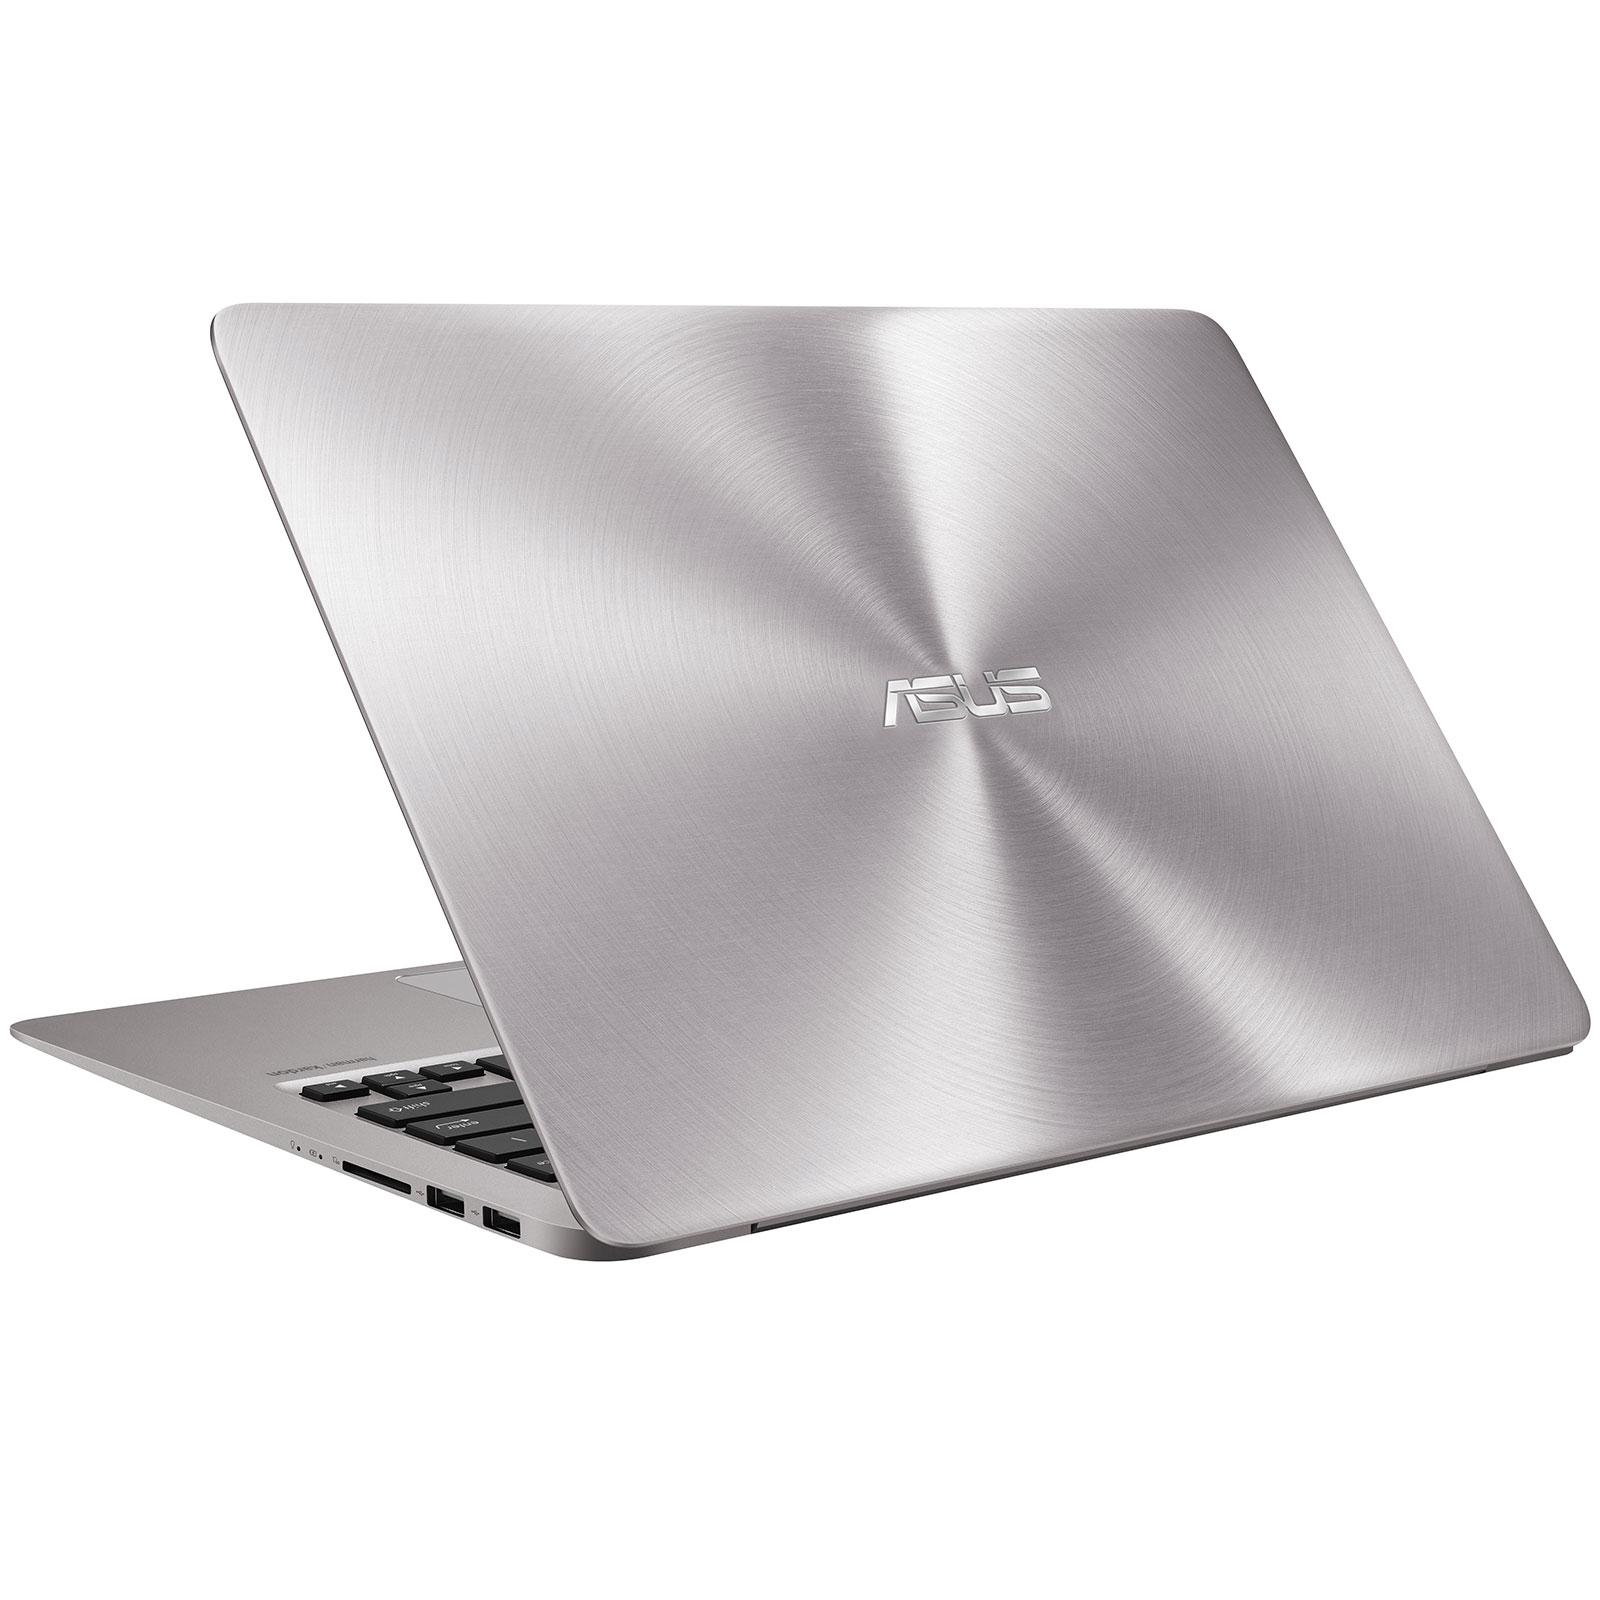 UX410UA-GV334R (90NB0DL1-M12430) - Achat / Vente PC portable sur Picata.fr - 2